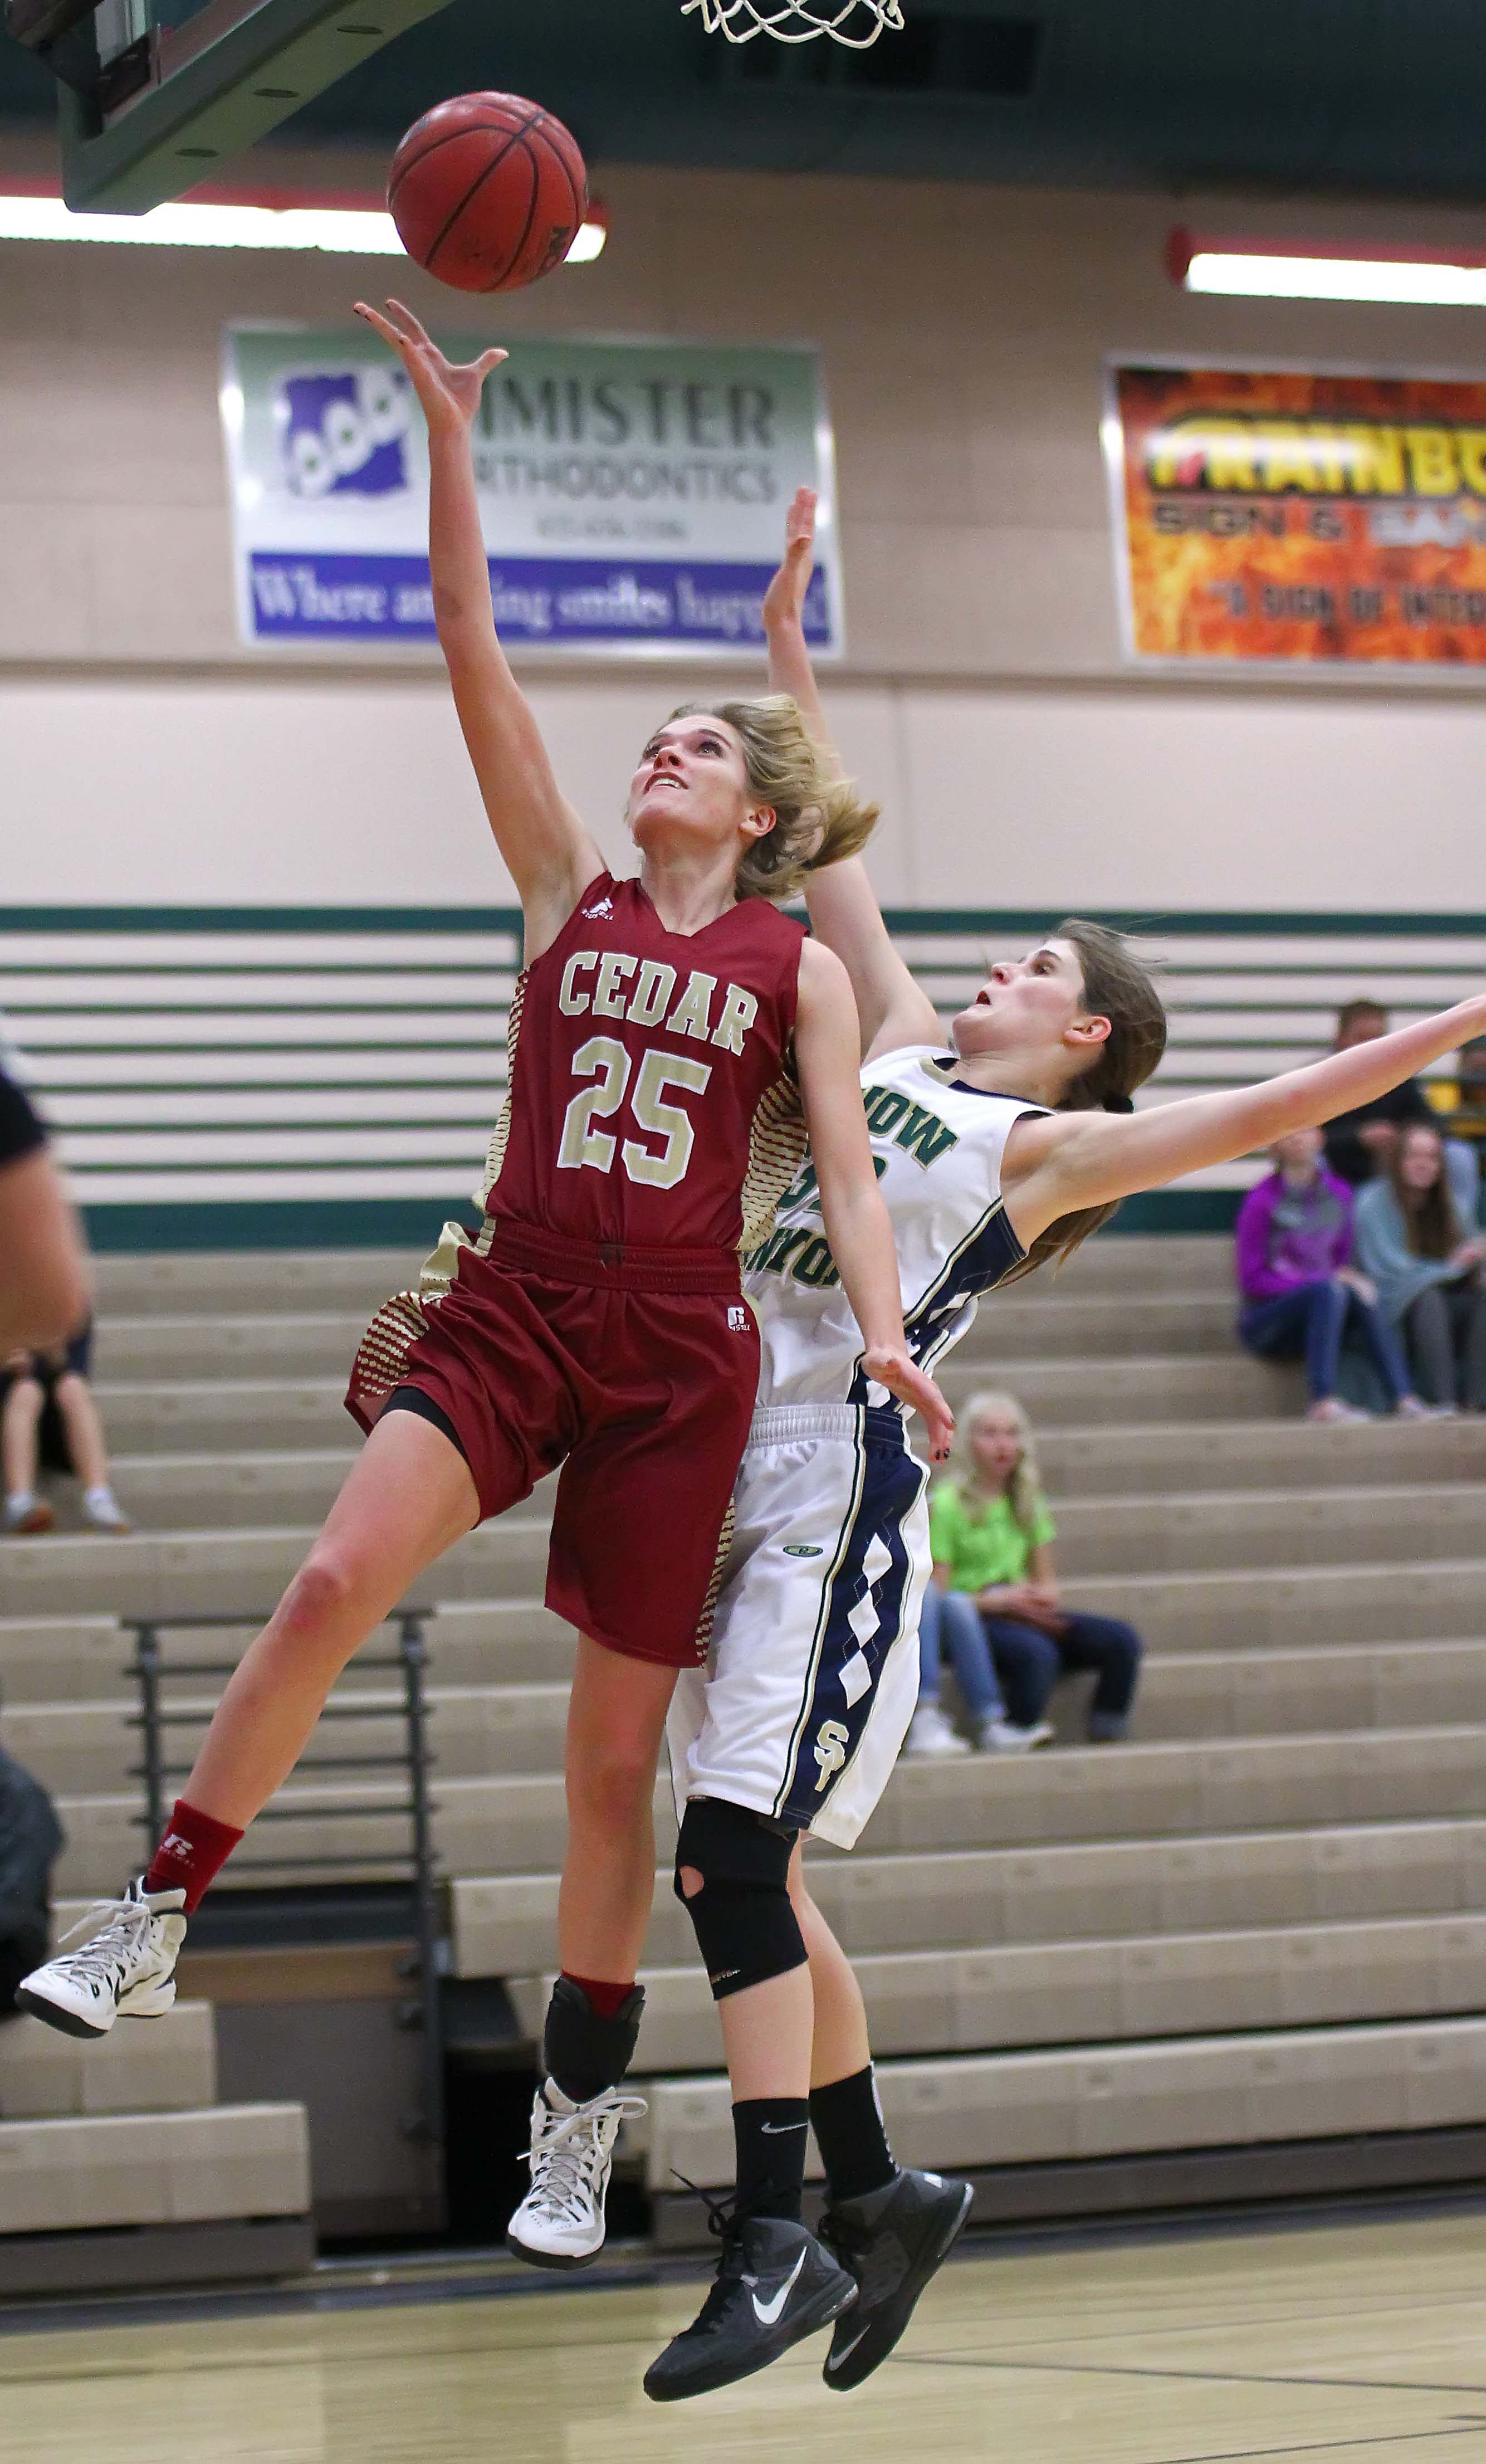 Cedar's Carly Davis (25), Snow Canyon vs. Cedar, Girls Basketball, St. George, Utah, Jan. 12, 2016, | Photo by Robert Hoppie, ASPpix.com, St. George News